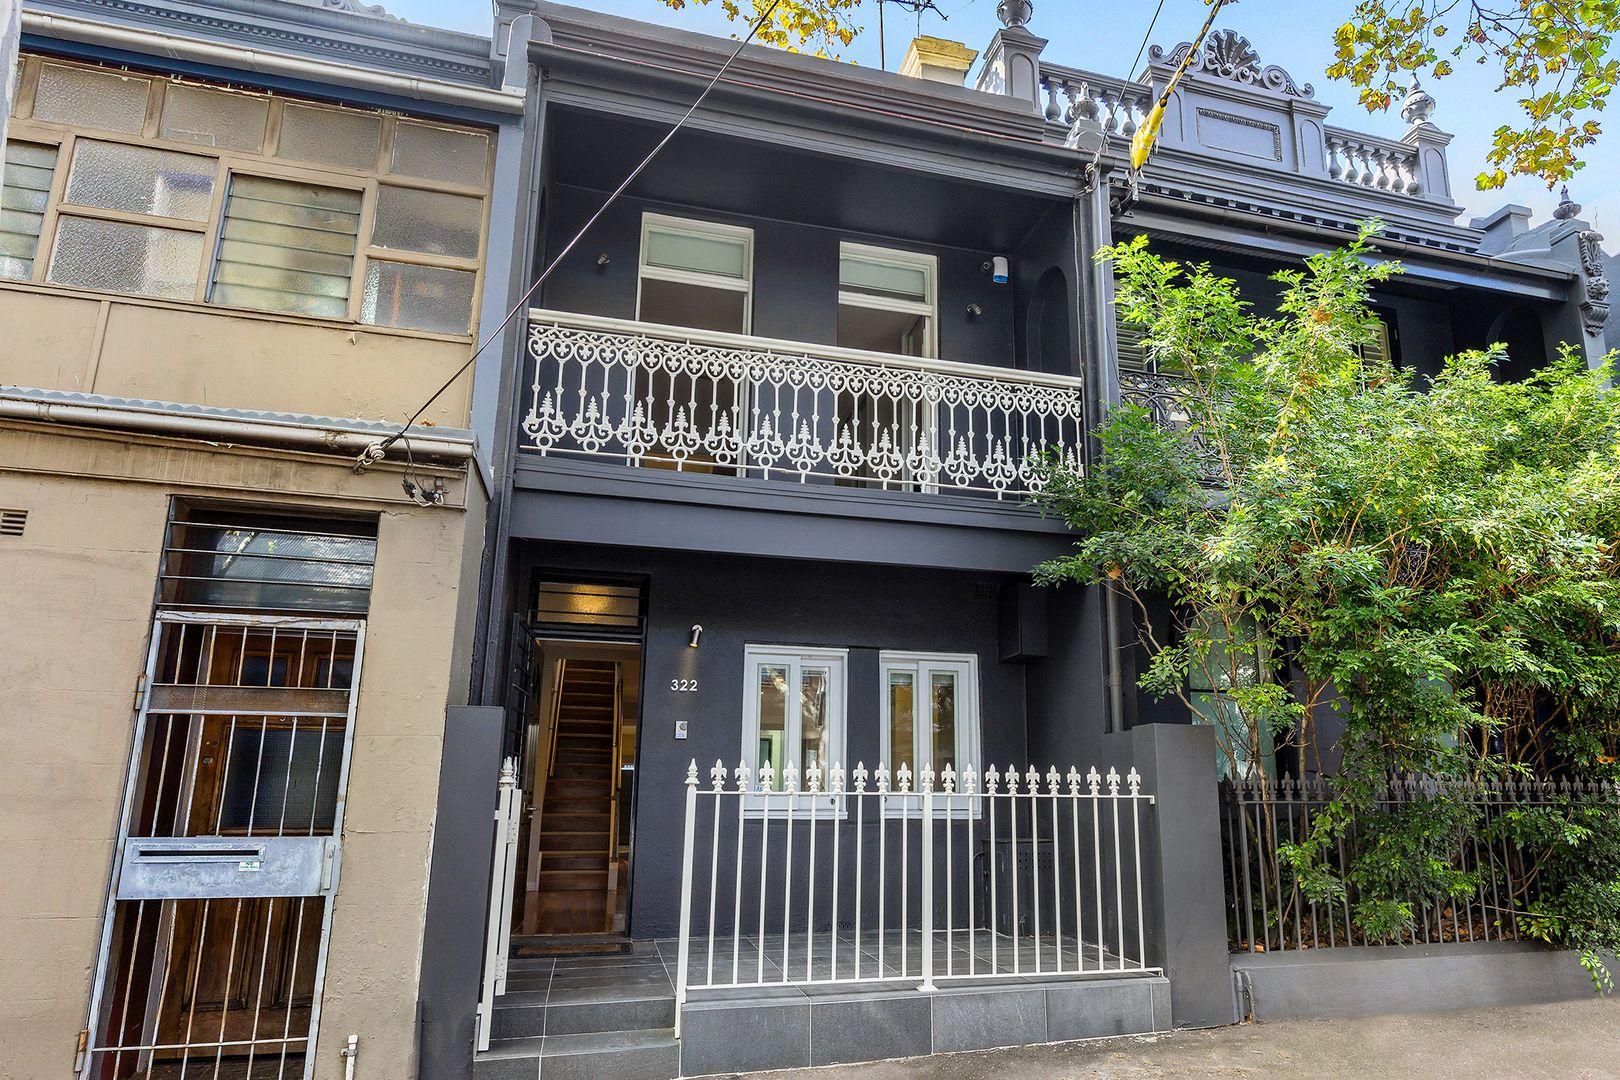 322 South Dowling Street, Paddington NSW 2021, Image 0